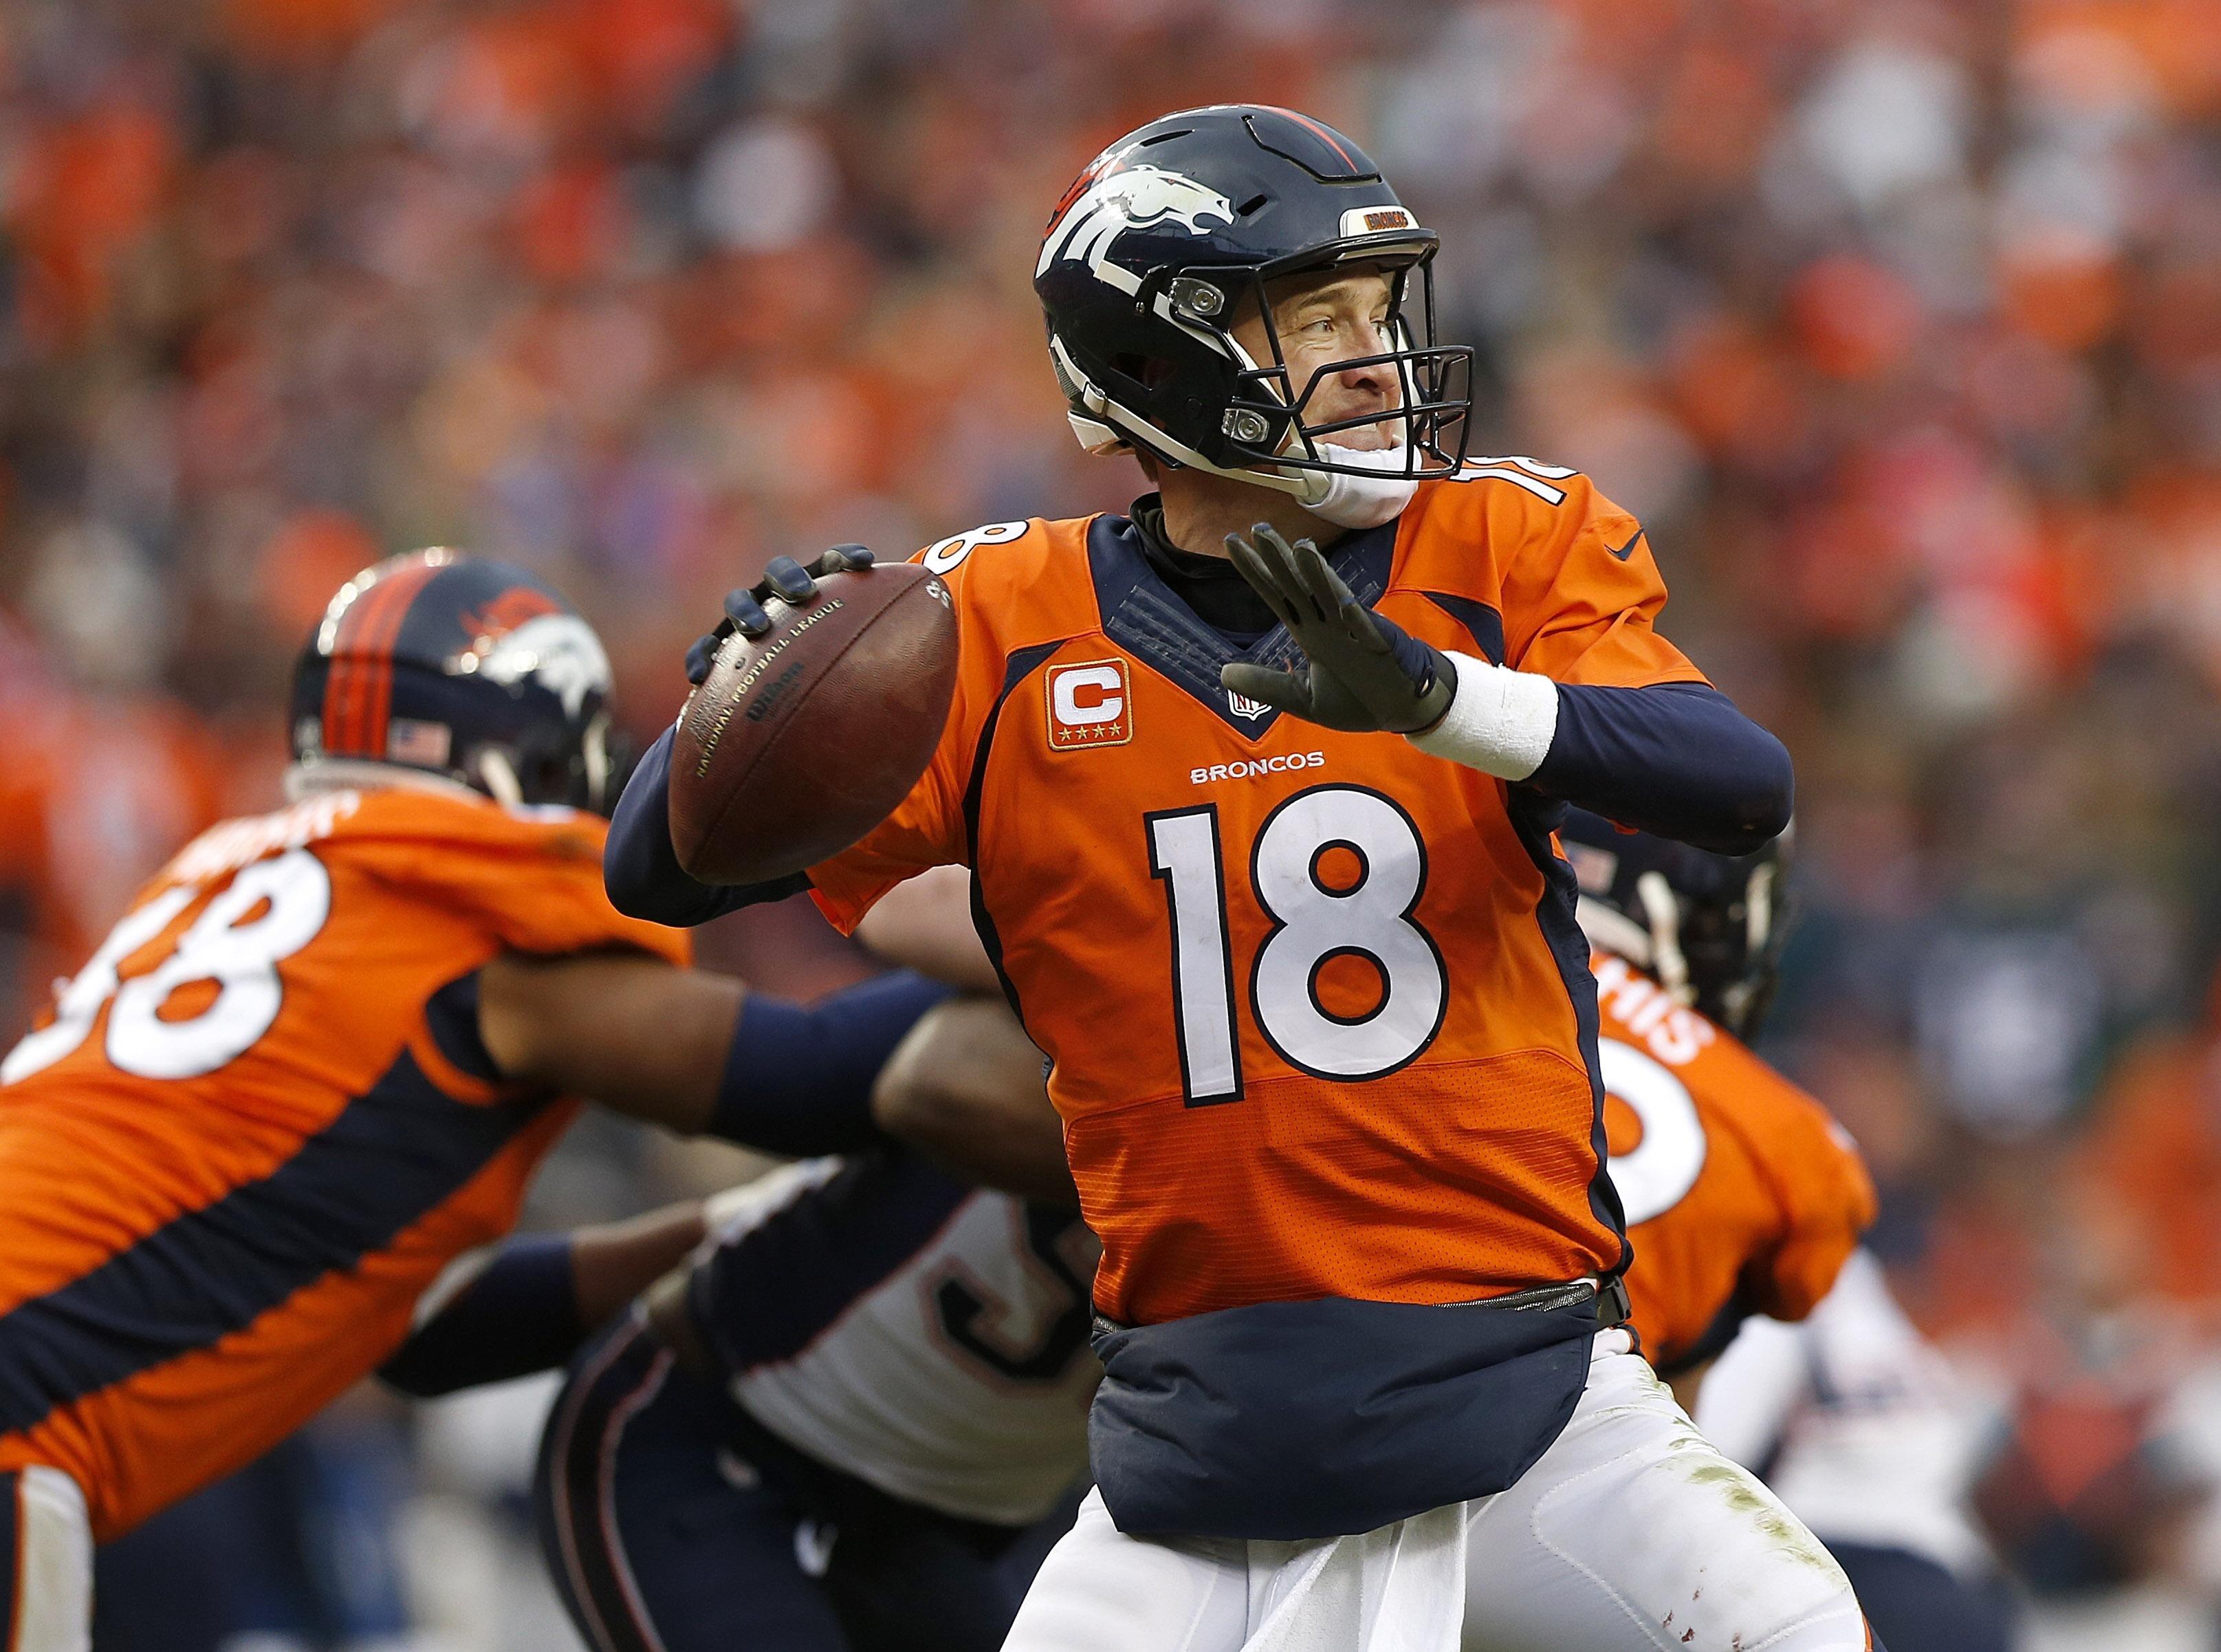 Super Bowl Could Be Peyton Manning's Last Game, Cam Newton's with regard to Peyton Manning Super Bowl